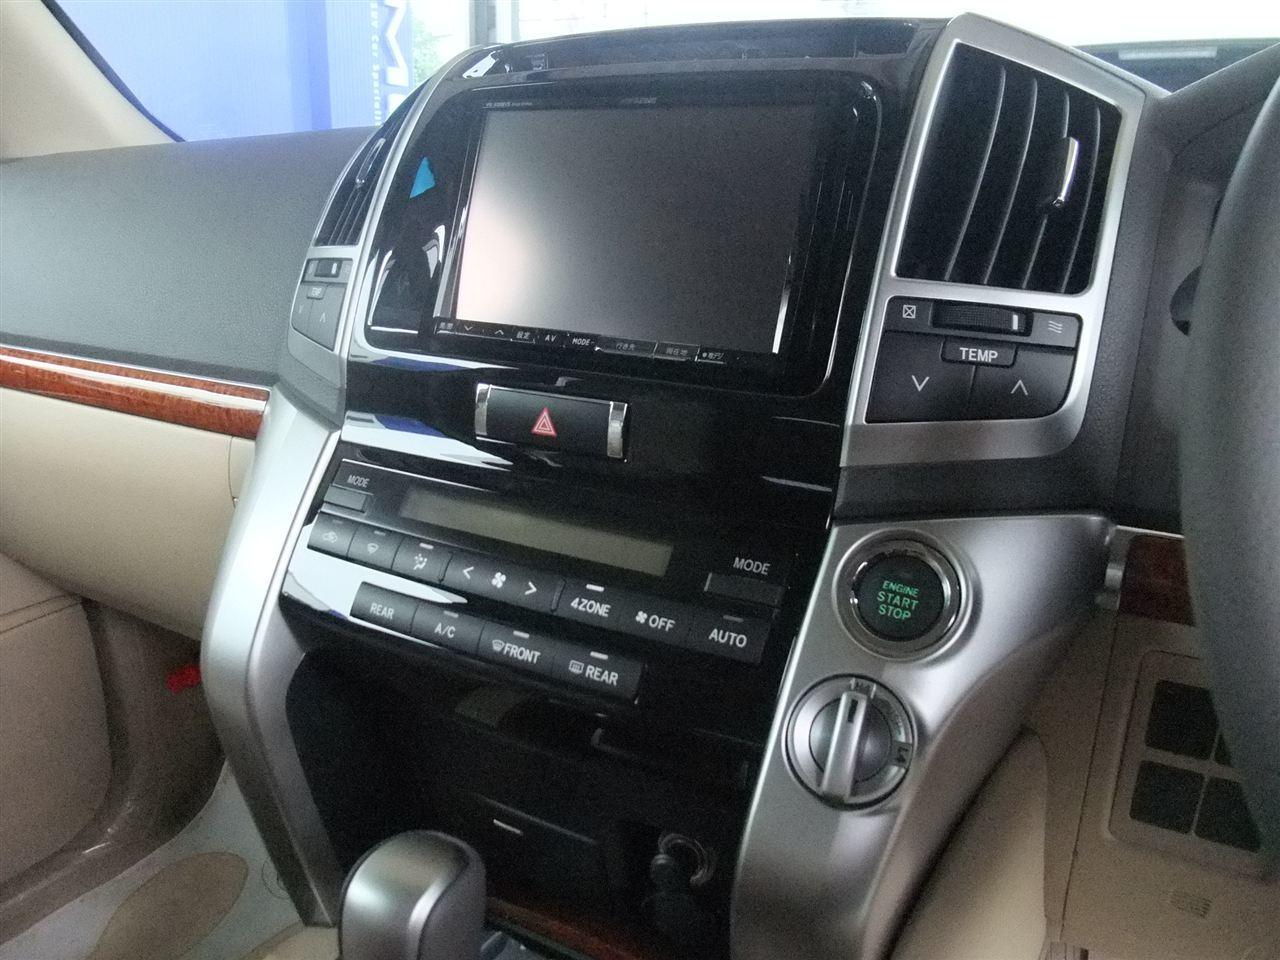 2DIN + Адаптер Toyota Landcruiser 200 (2007-2009)